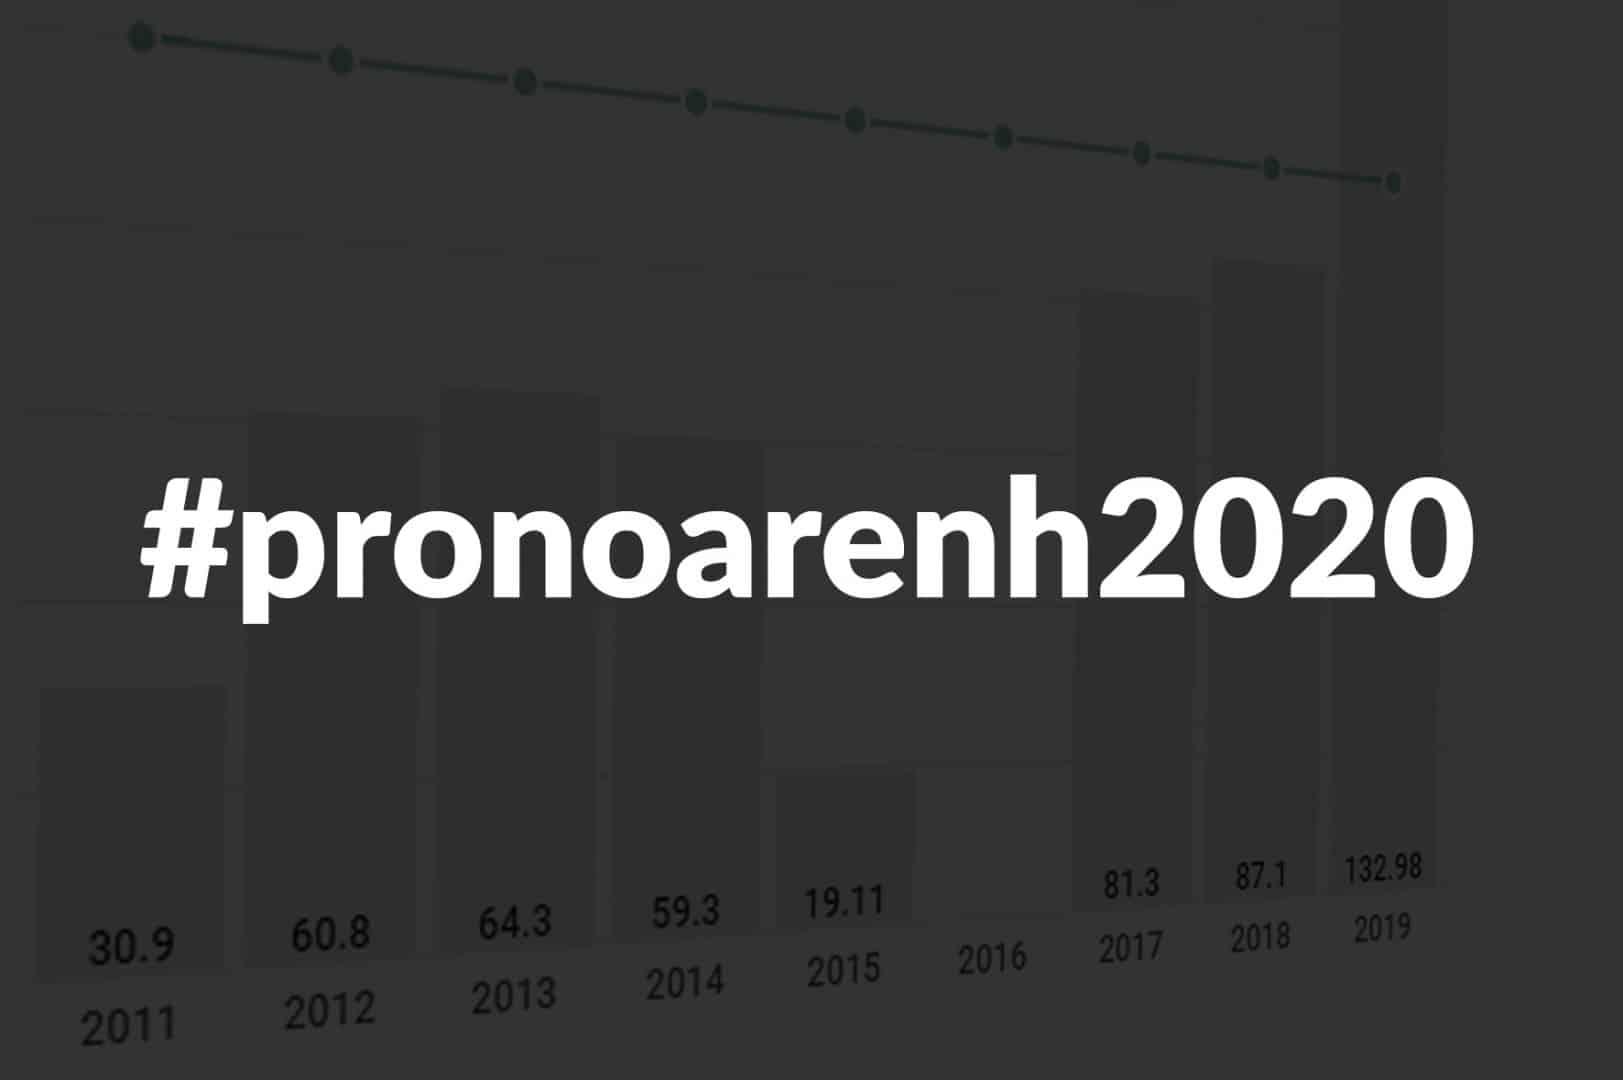 Visuel prono arenh 2020